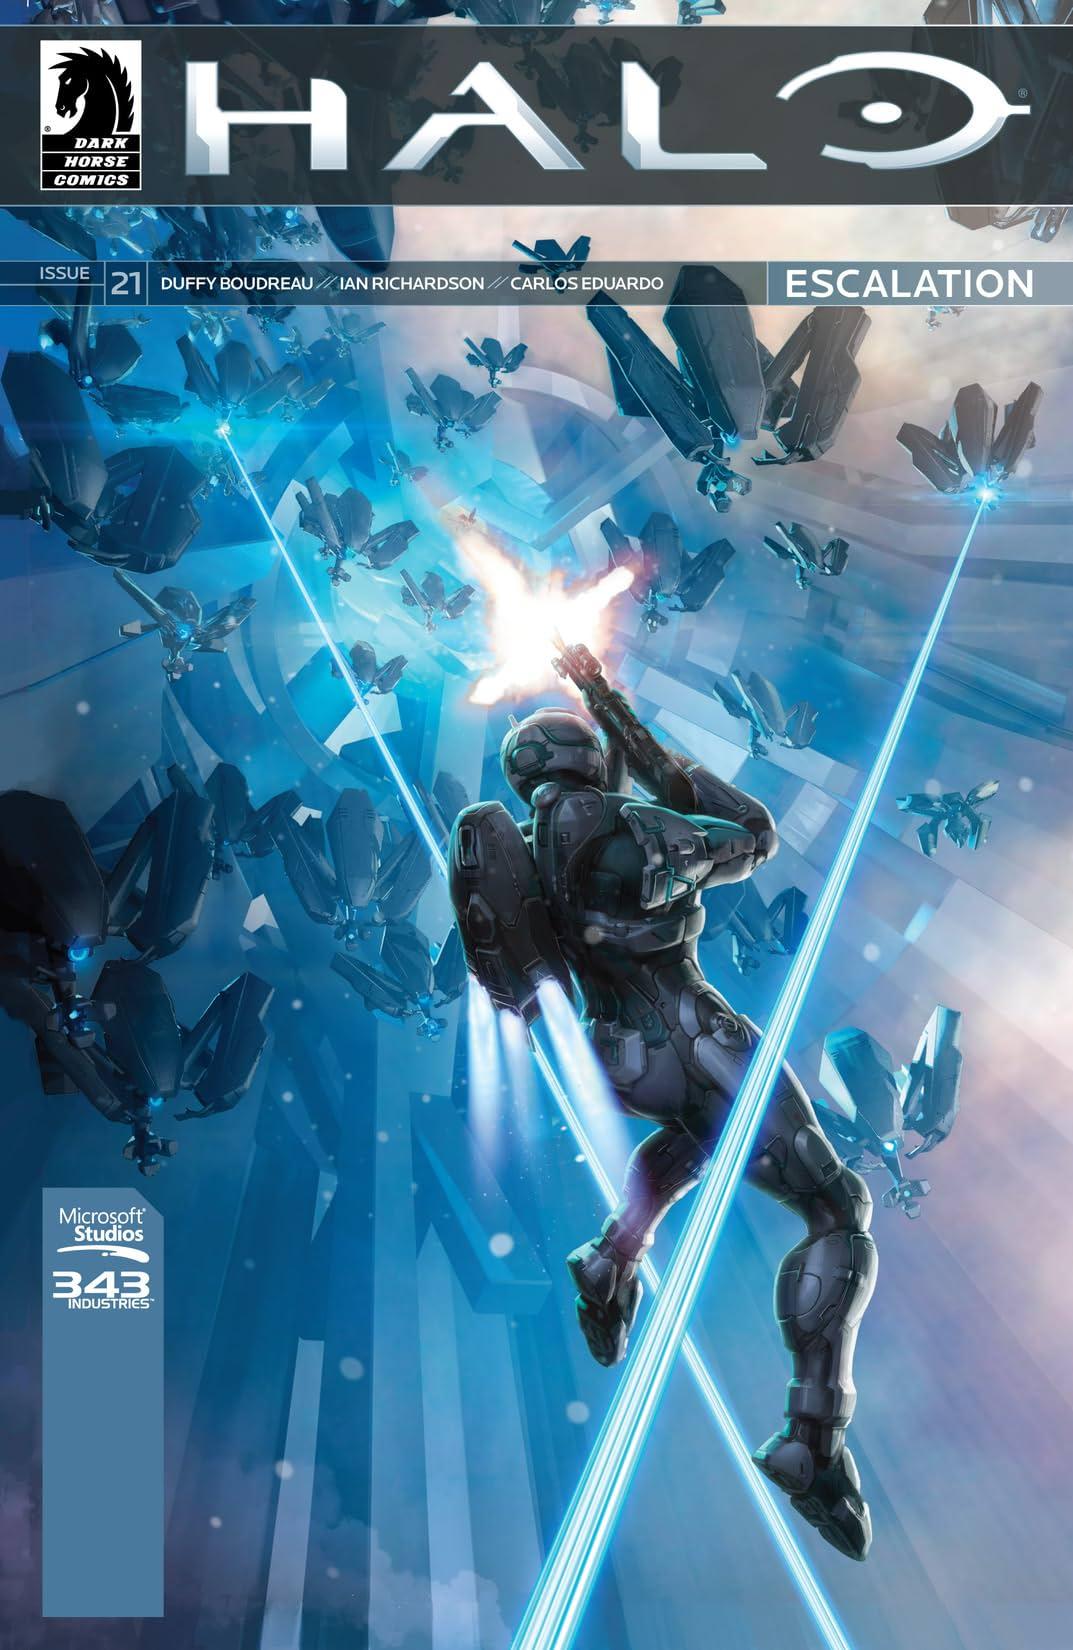 Halo: Escalation #21